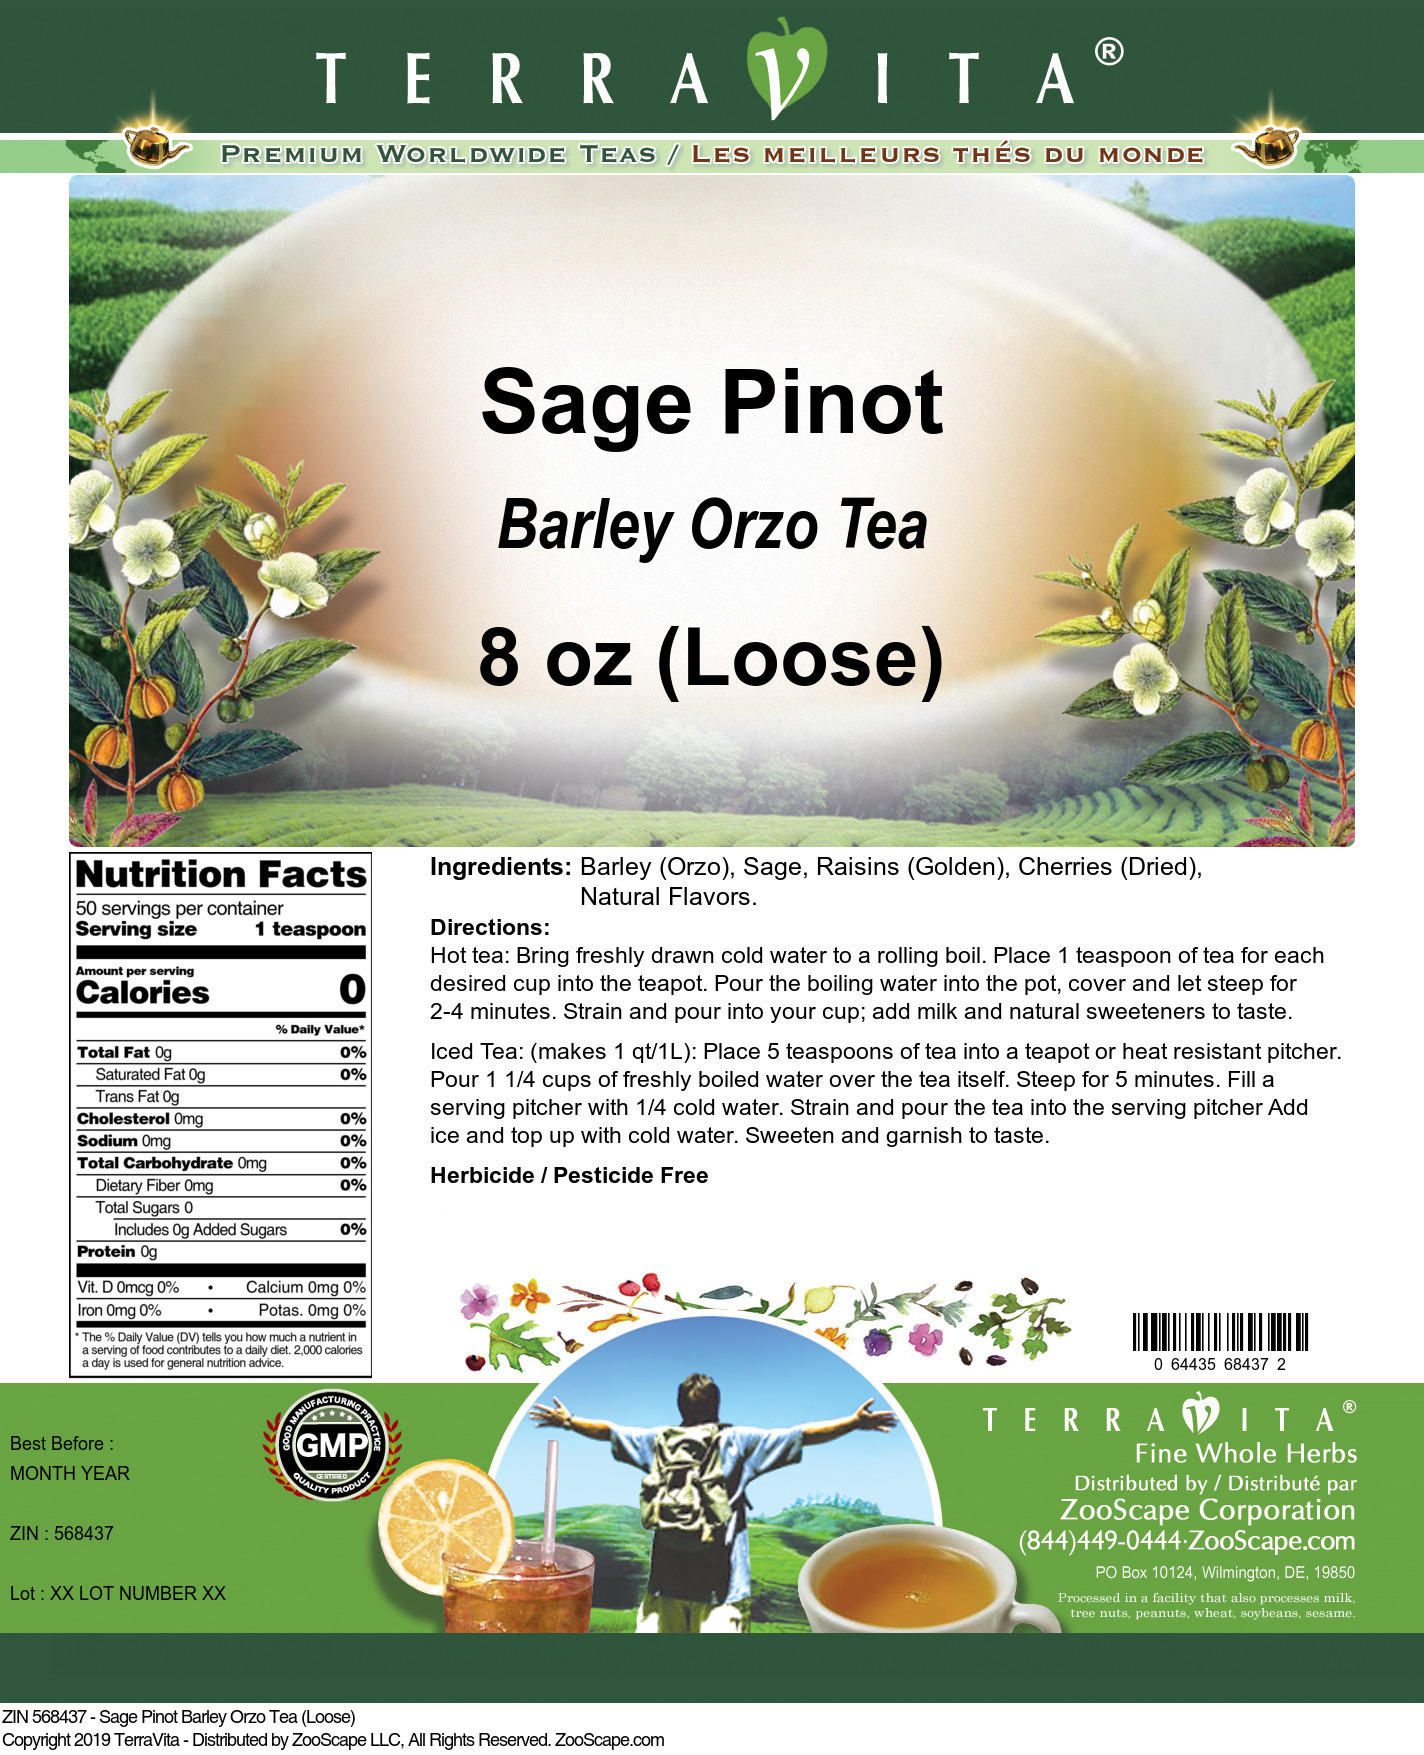 Sage Pinot Barley Orzo